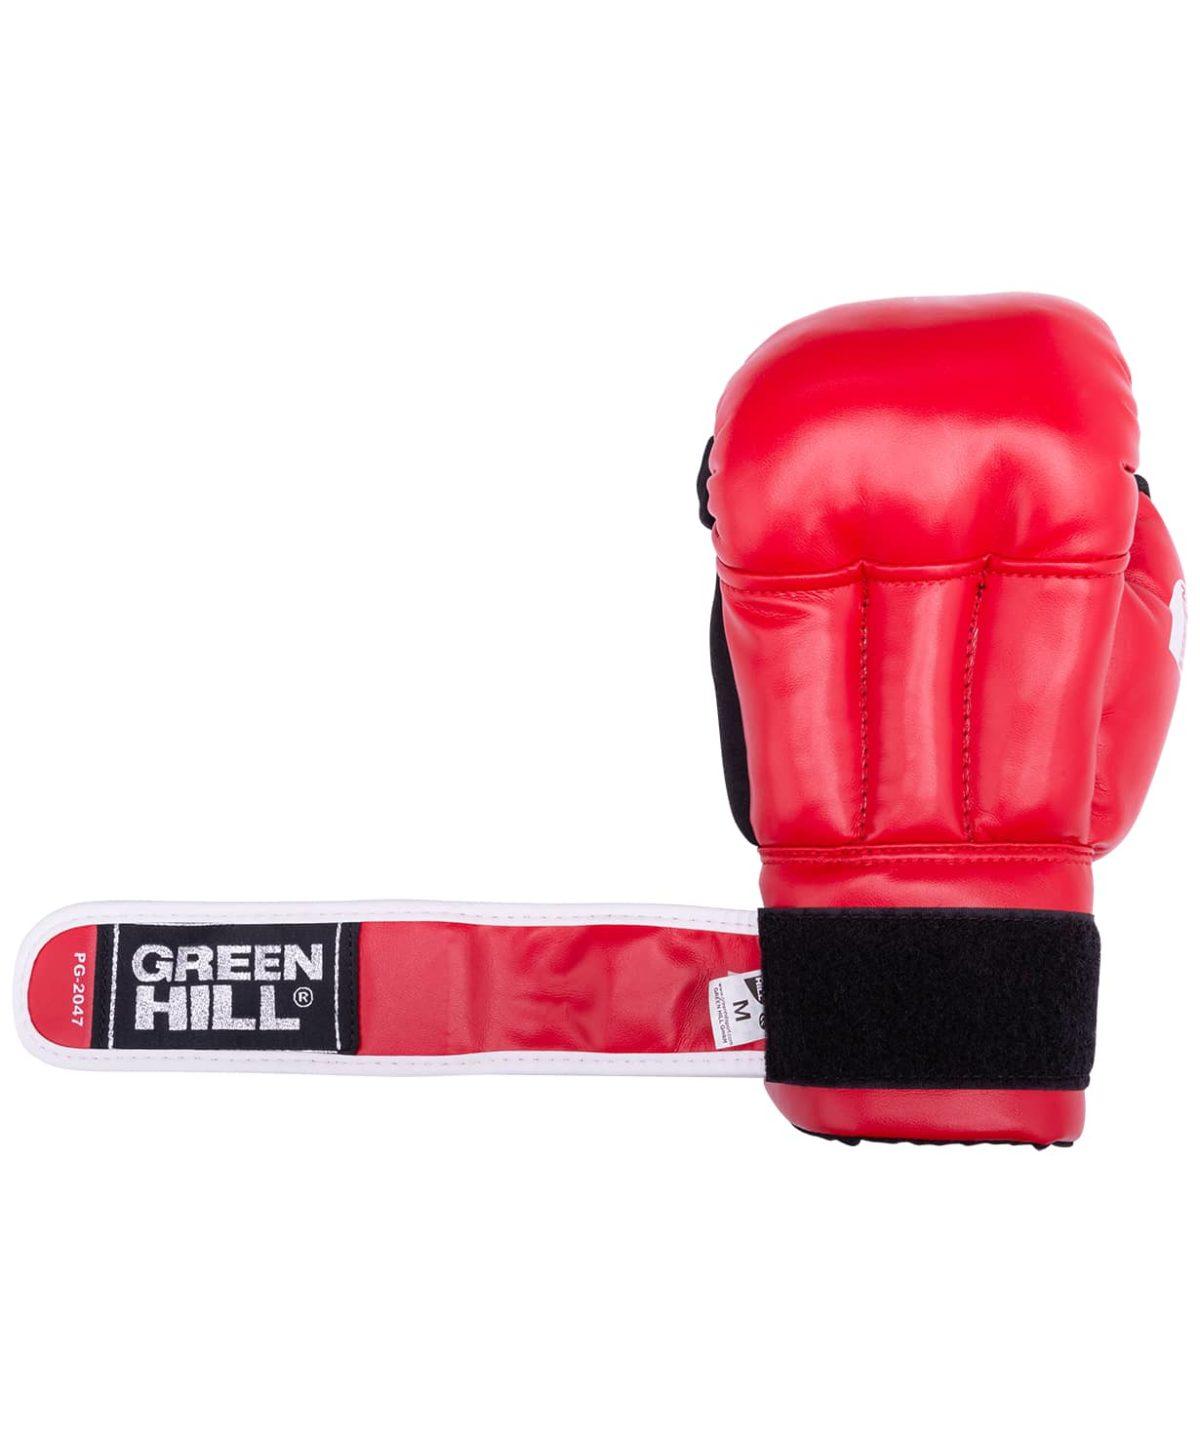 GREEN HILL Перчатки для рукопашного боя, к/з  PG-2047 - 2